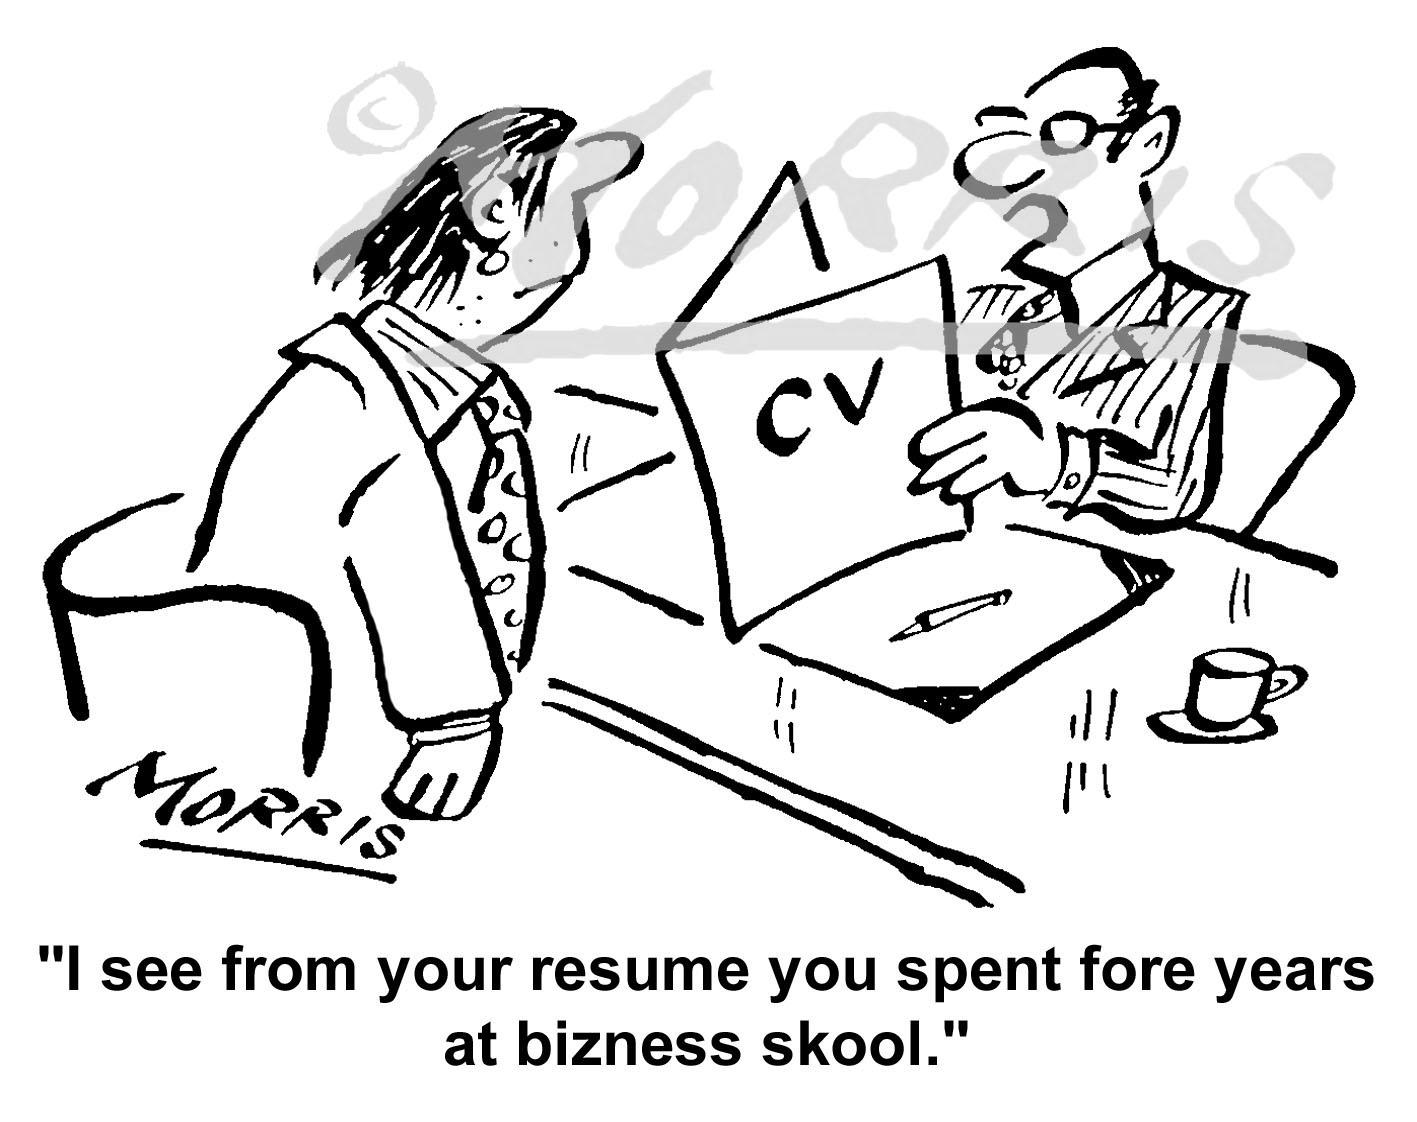 CV cartoon, Resume cartoon, Interview cartoon